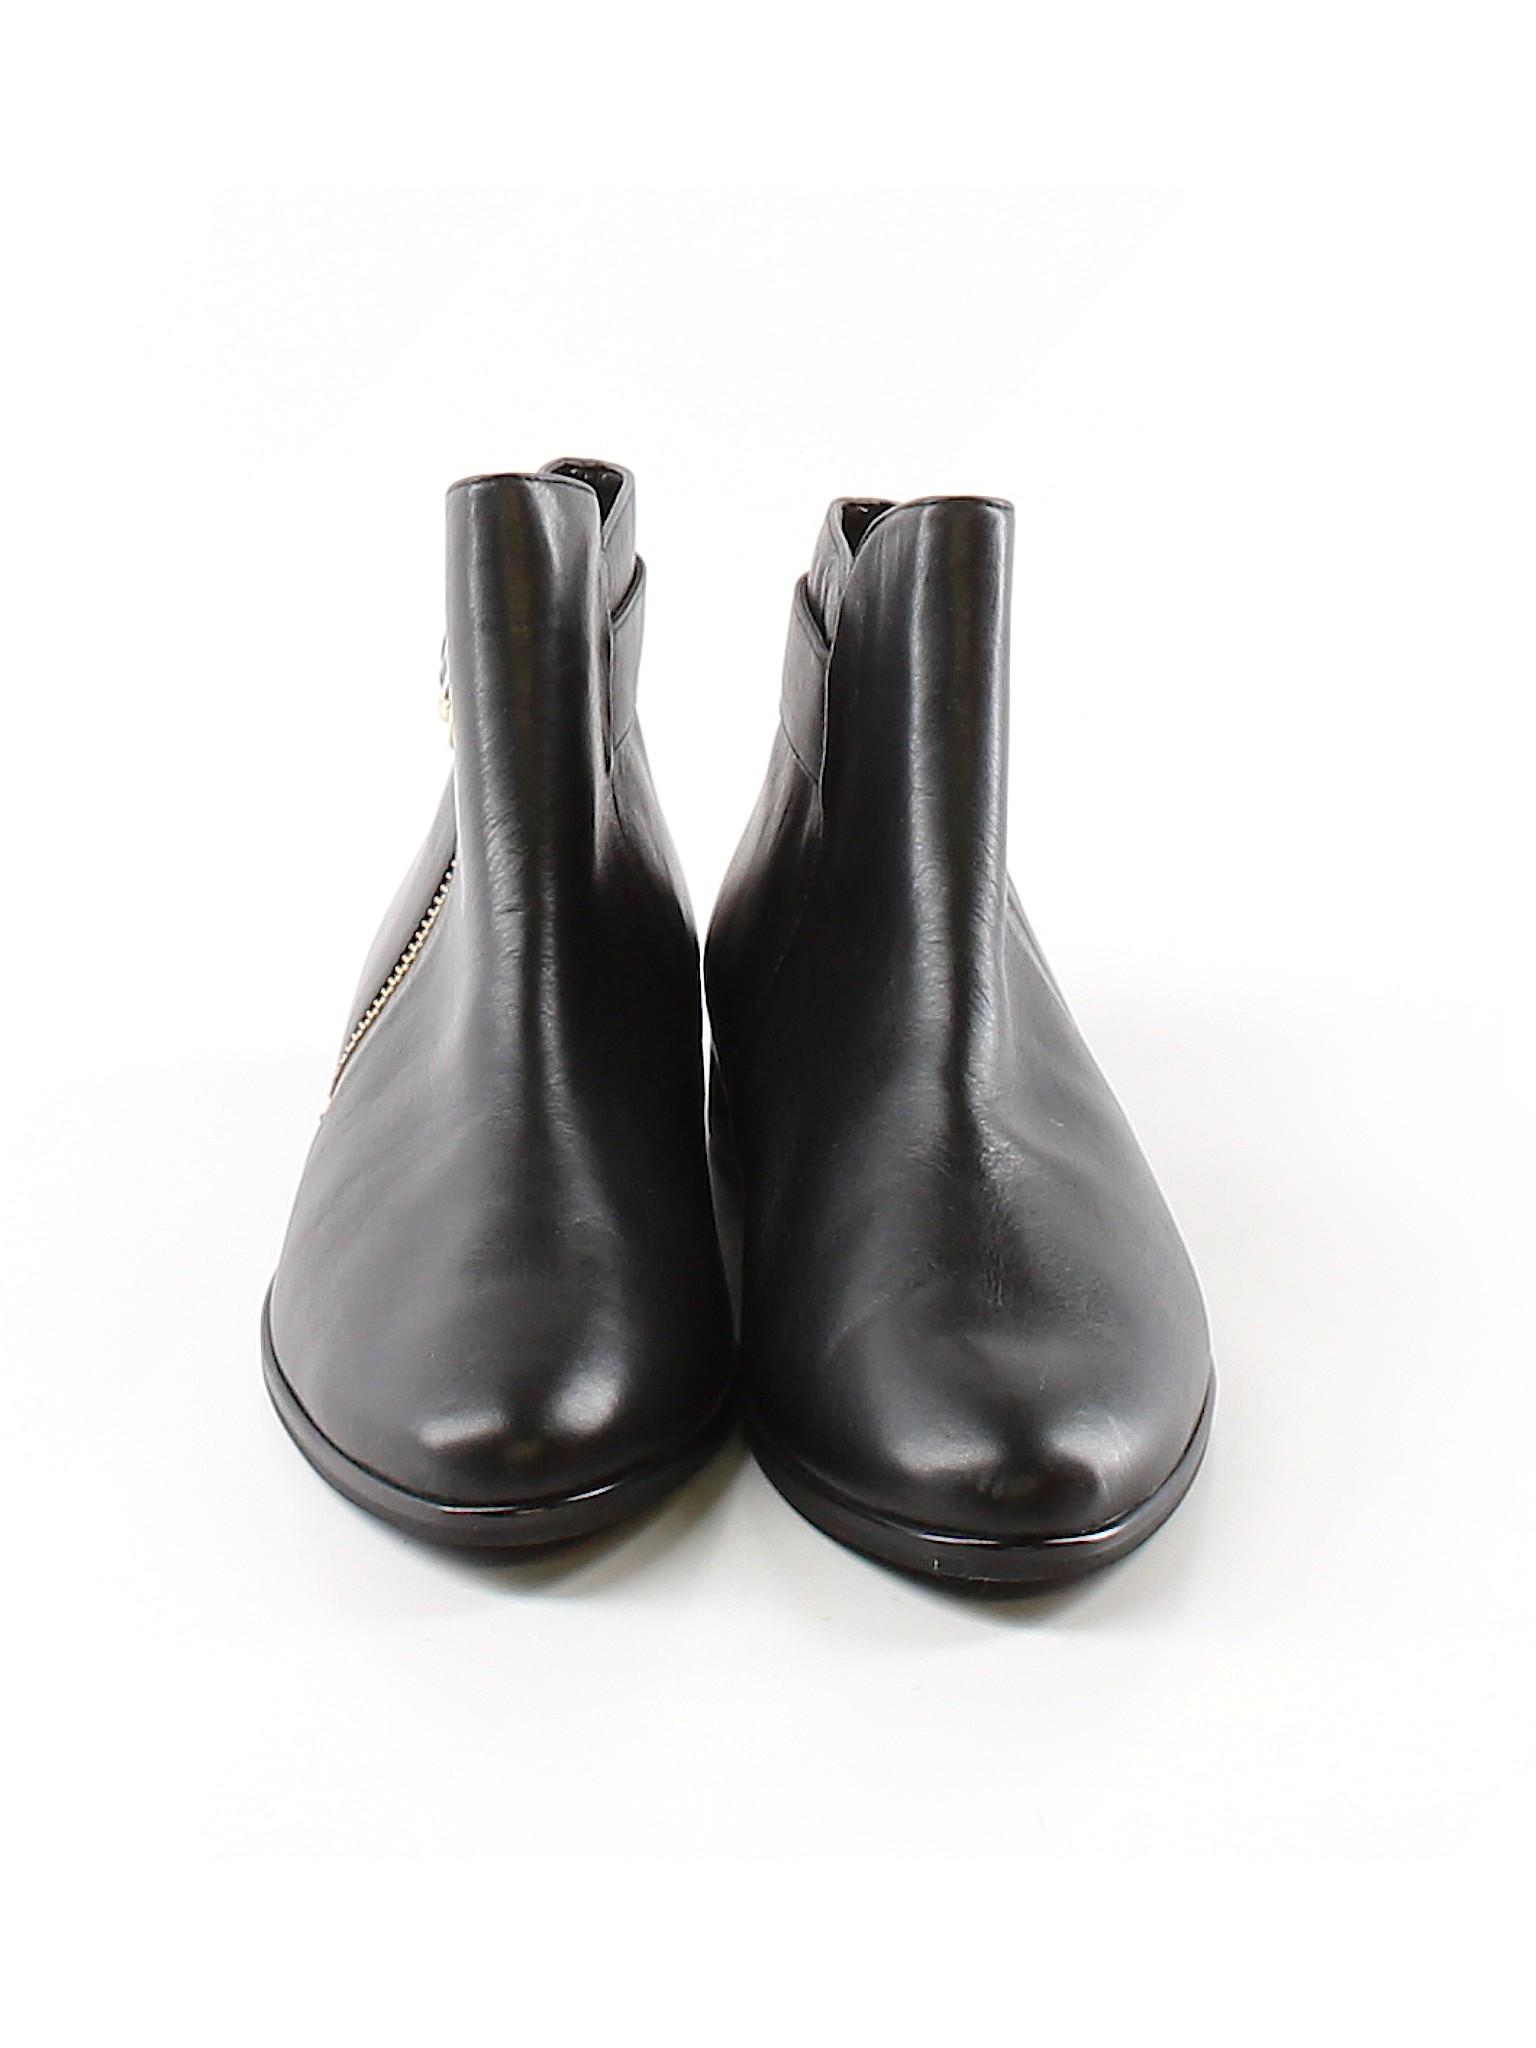 promotion Boots Boutique Boutique promotion Ankle Diana qwYUEY5X